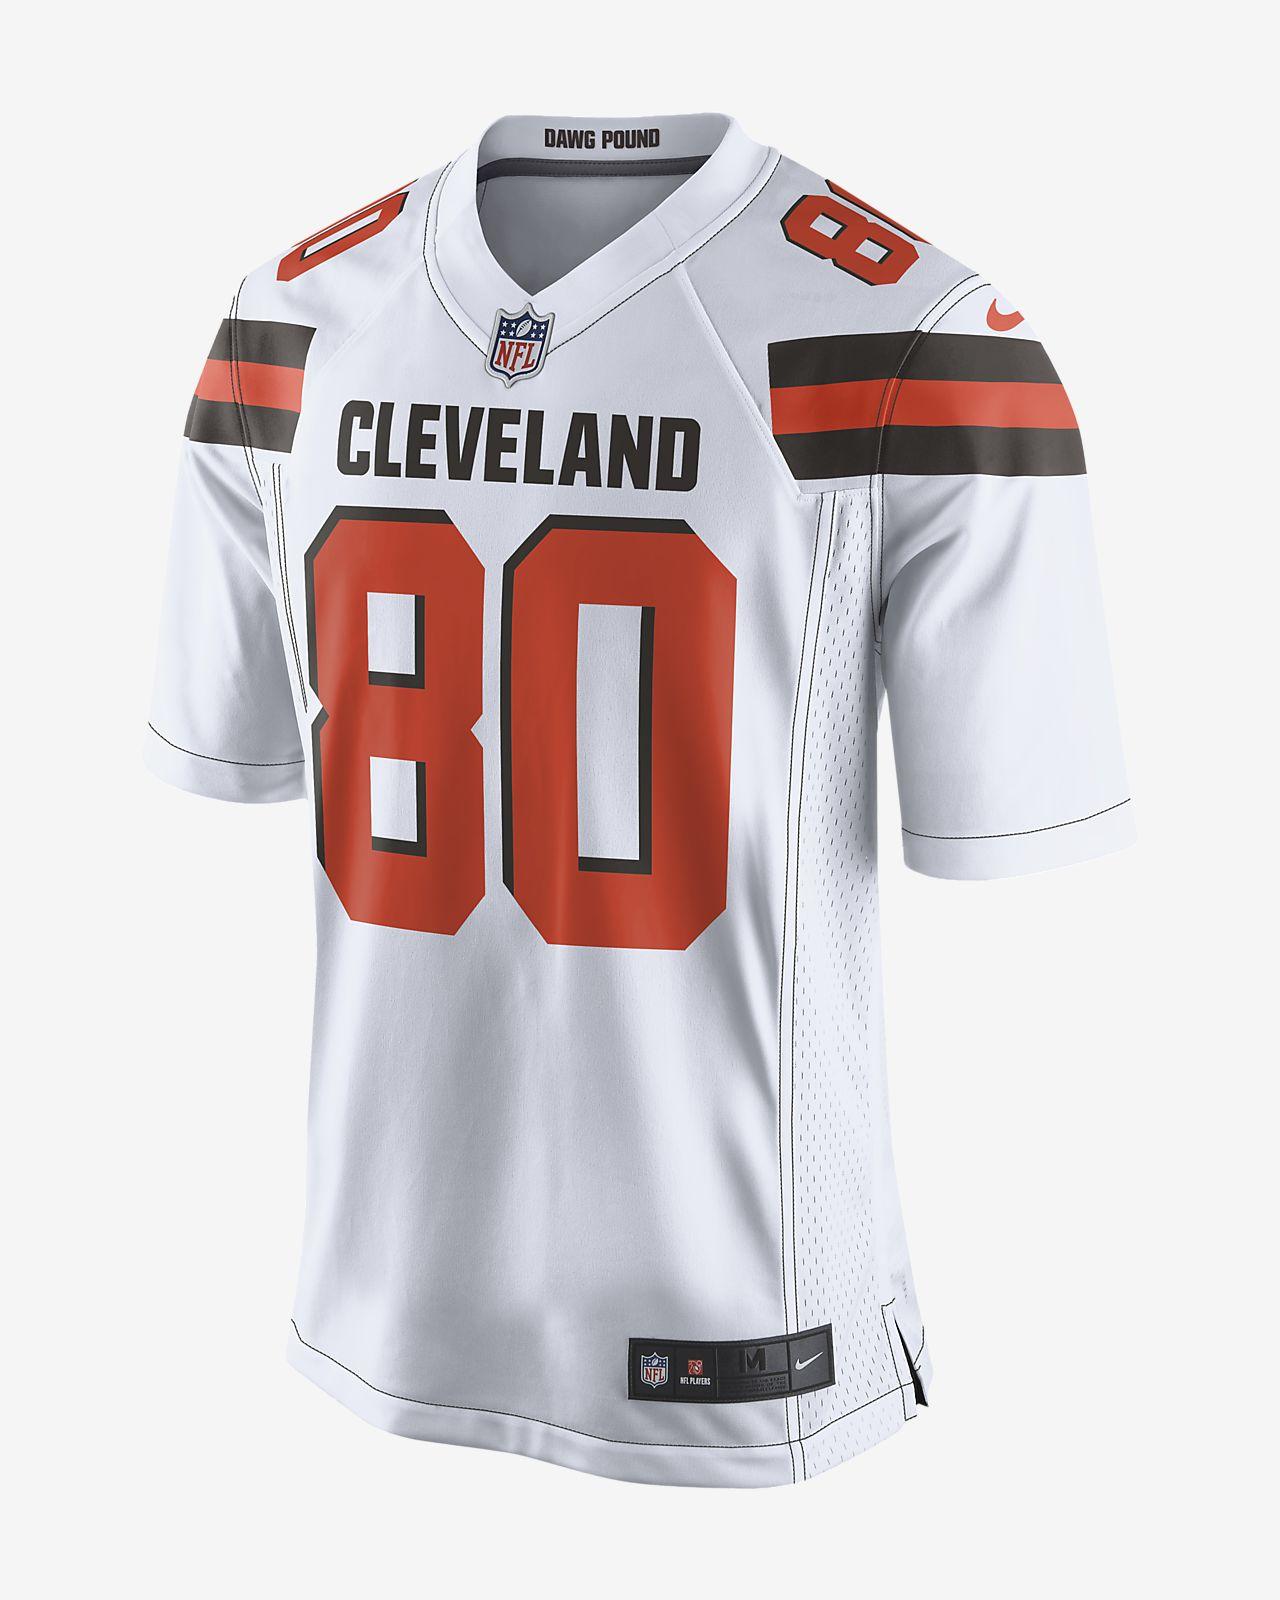 NFL Cleveland Browns (Jarvis Landry) Men's Game Football Jersey